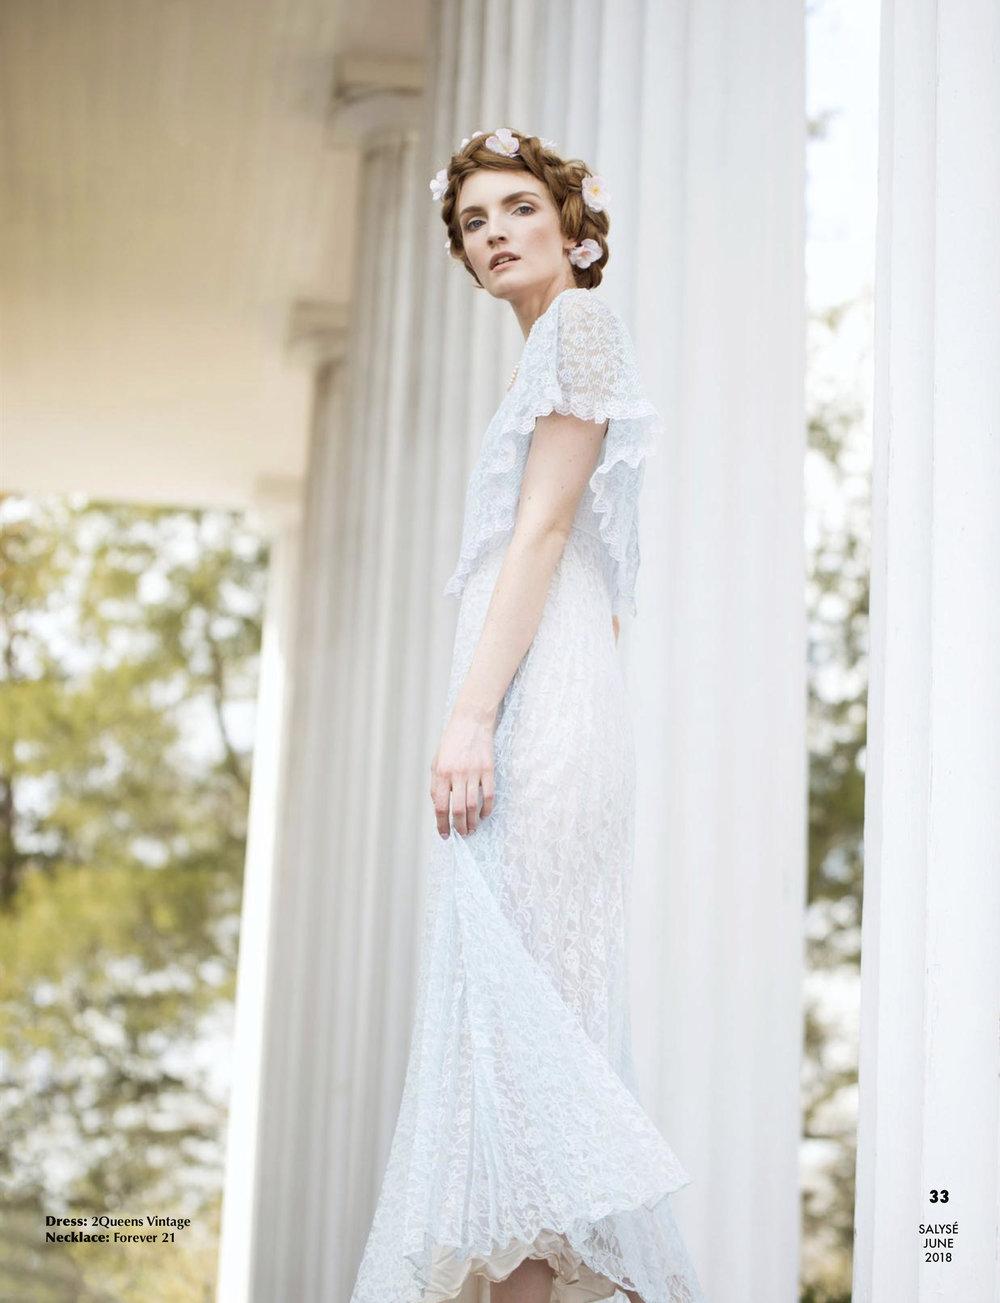 """Belle"" Fleur"" Published in Salyse Magazine  Model: Karen Powell  Agency: Ursula Wiedmann Models  Makeup + Hair: Ashley Langston  Stylist: Joy Hollywood"